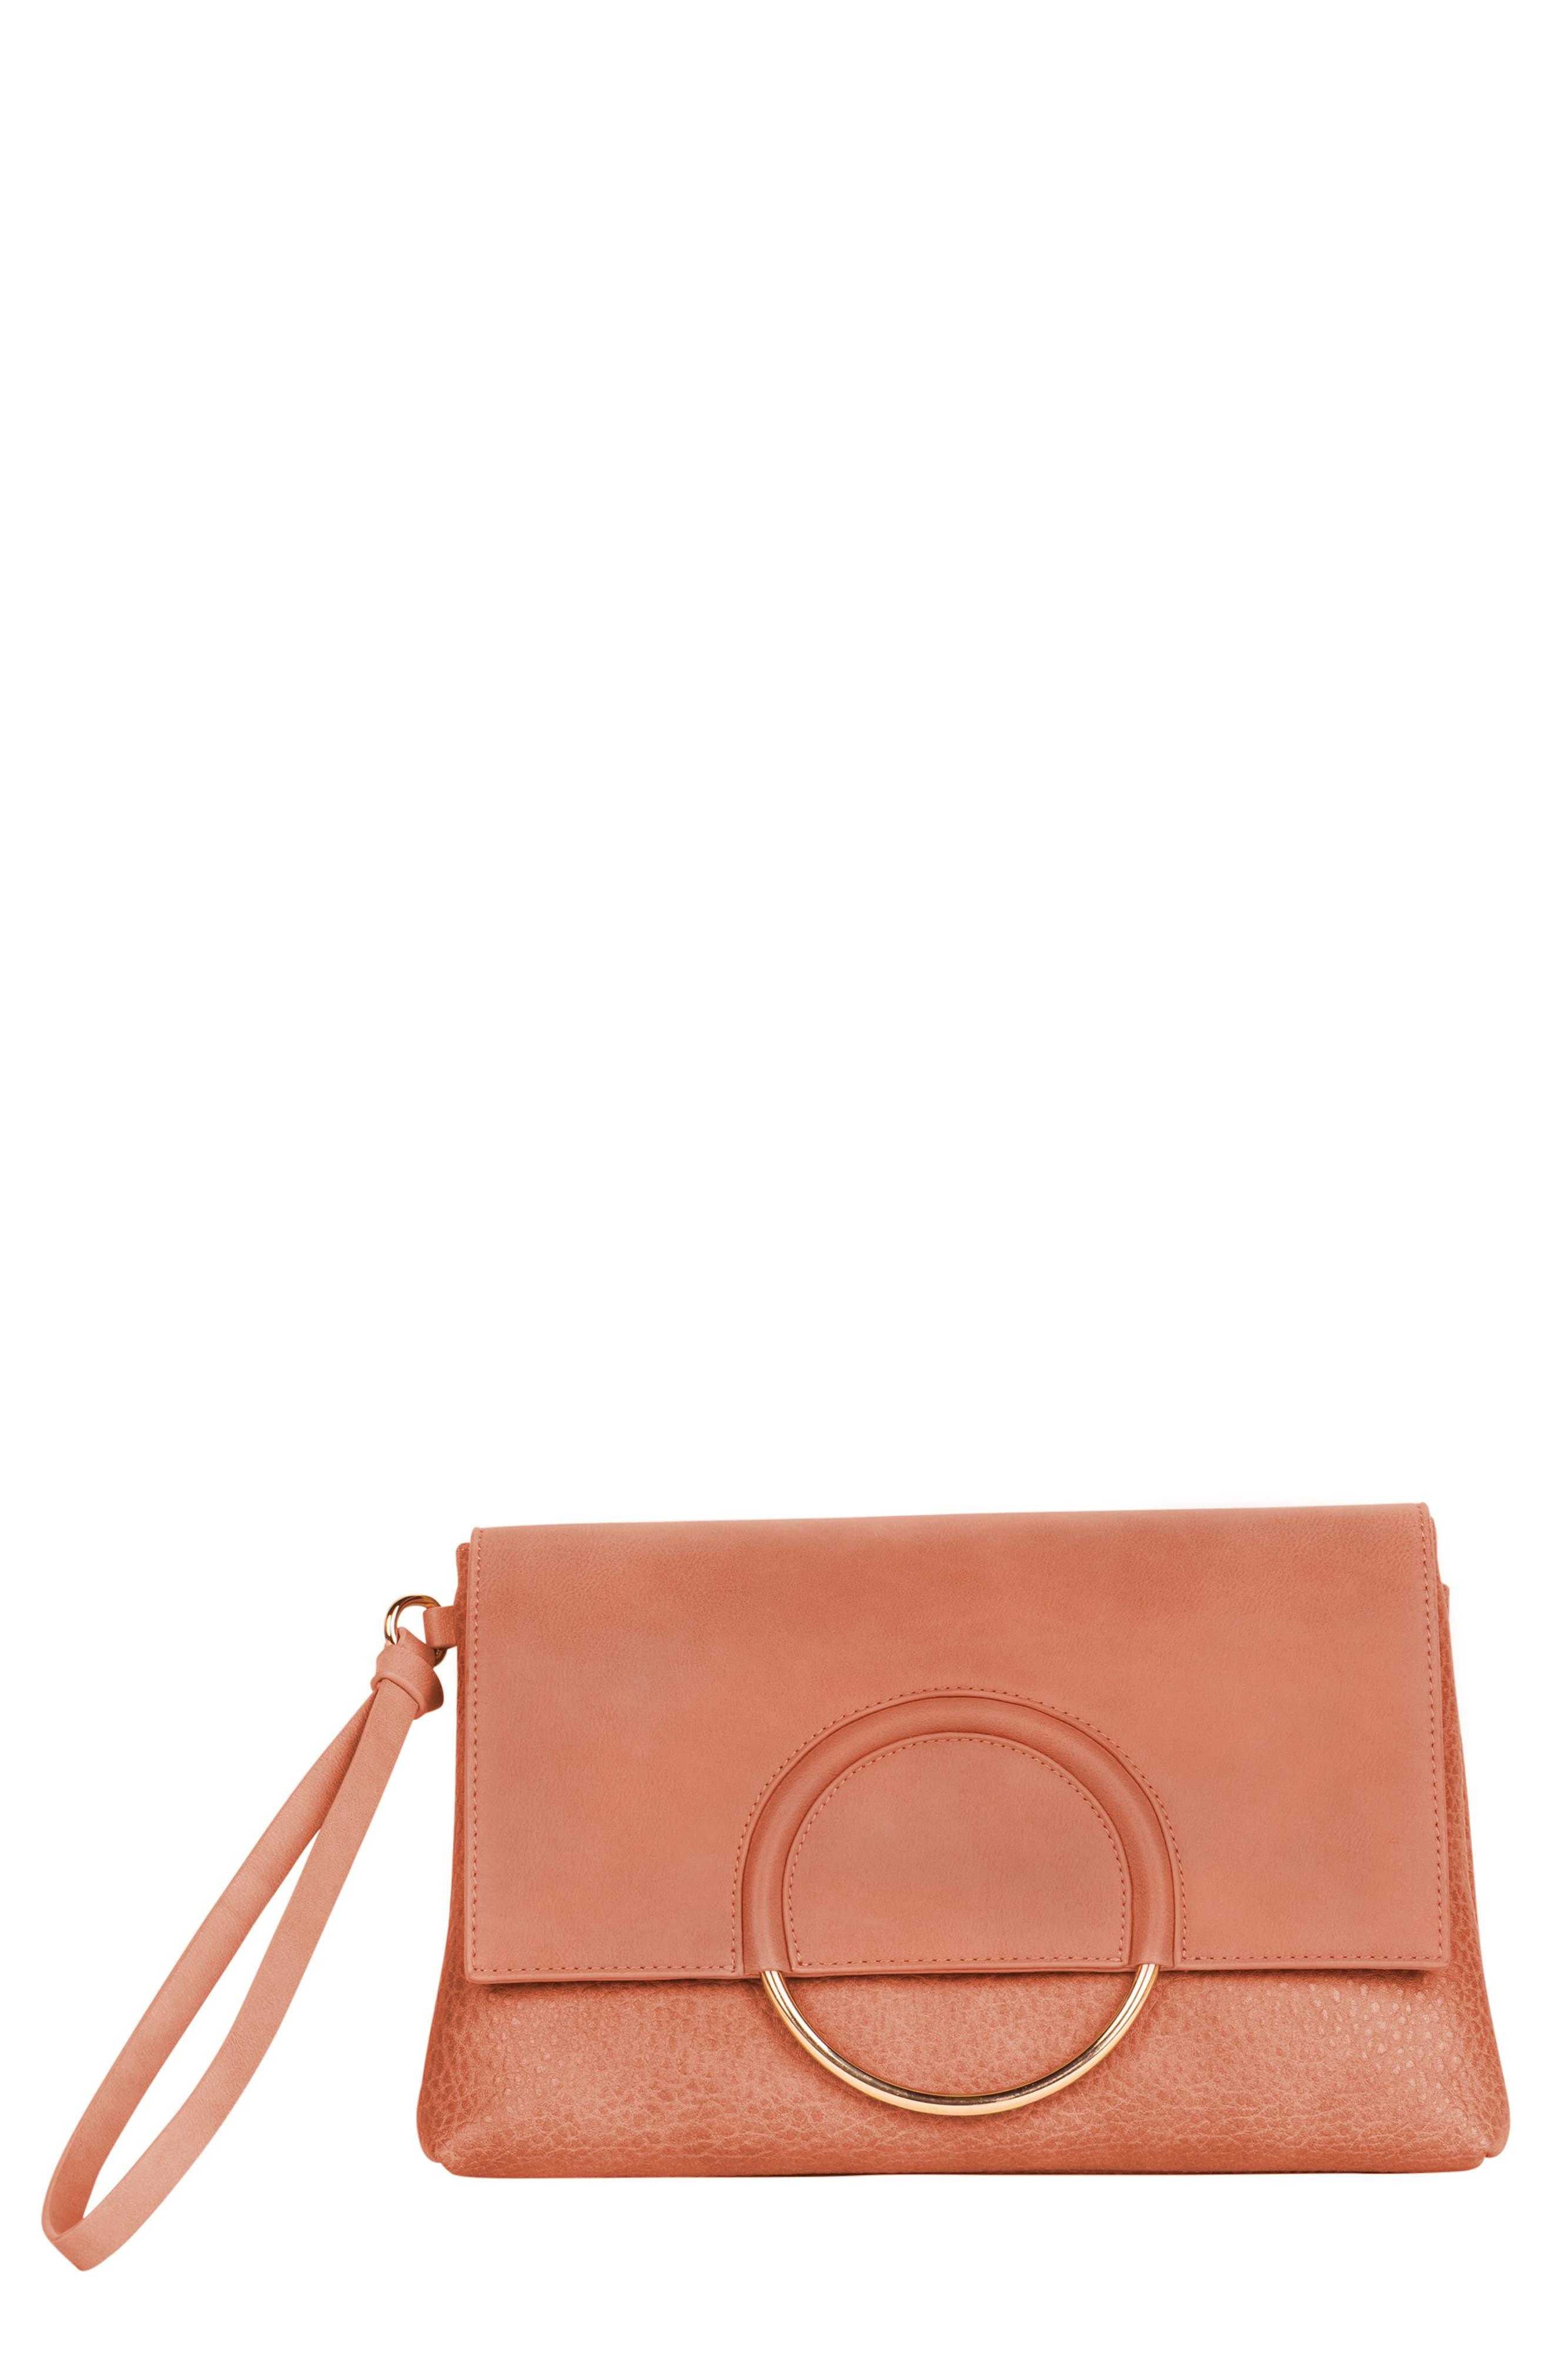 Custom Vegan Leather Wristlet Clutch,                         Main,                         color, ROSE PINK